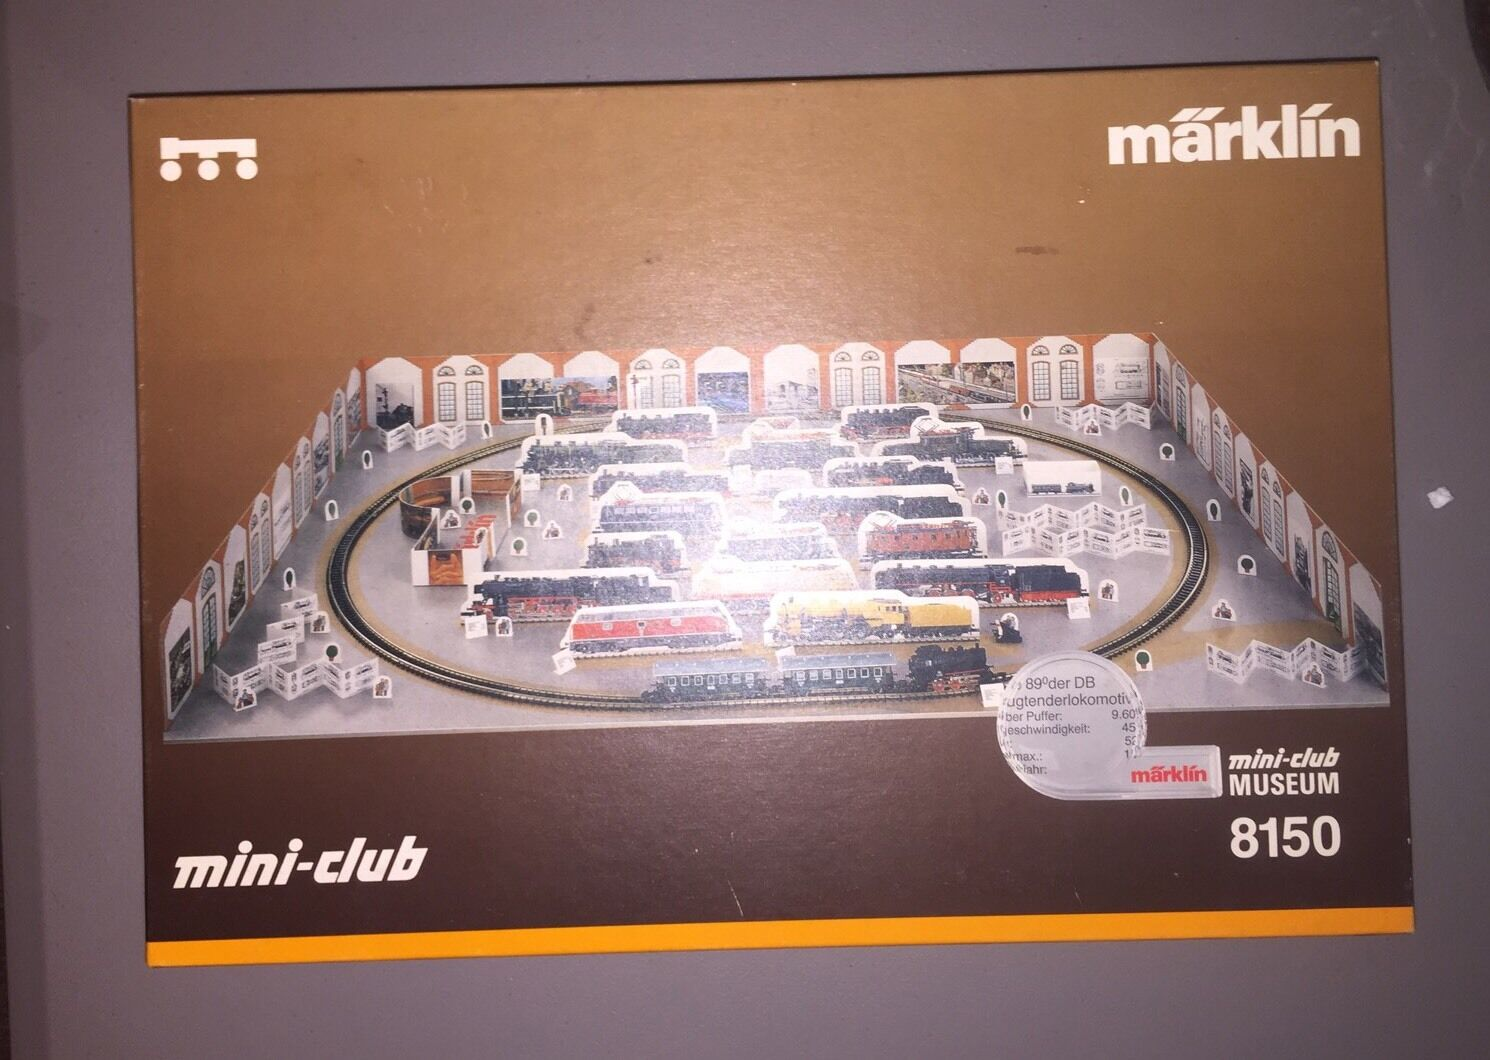 McLean Mini Club 8150, auto Musem tender, tender, tender, auto b89 Plus. e55